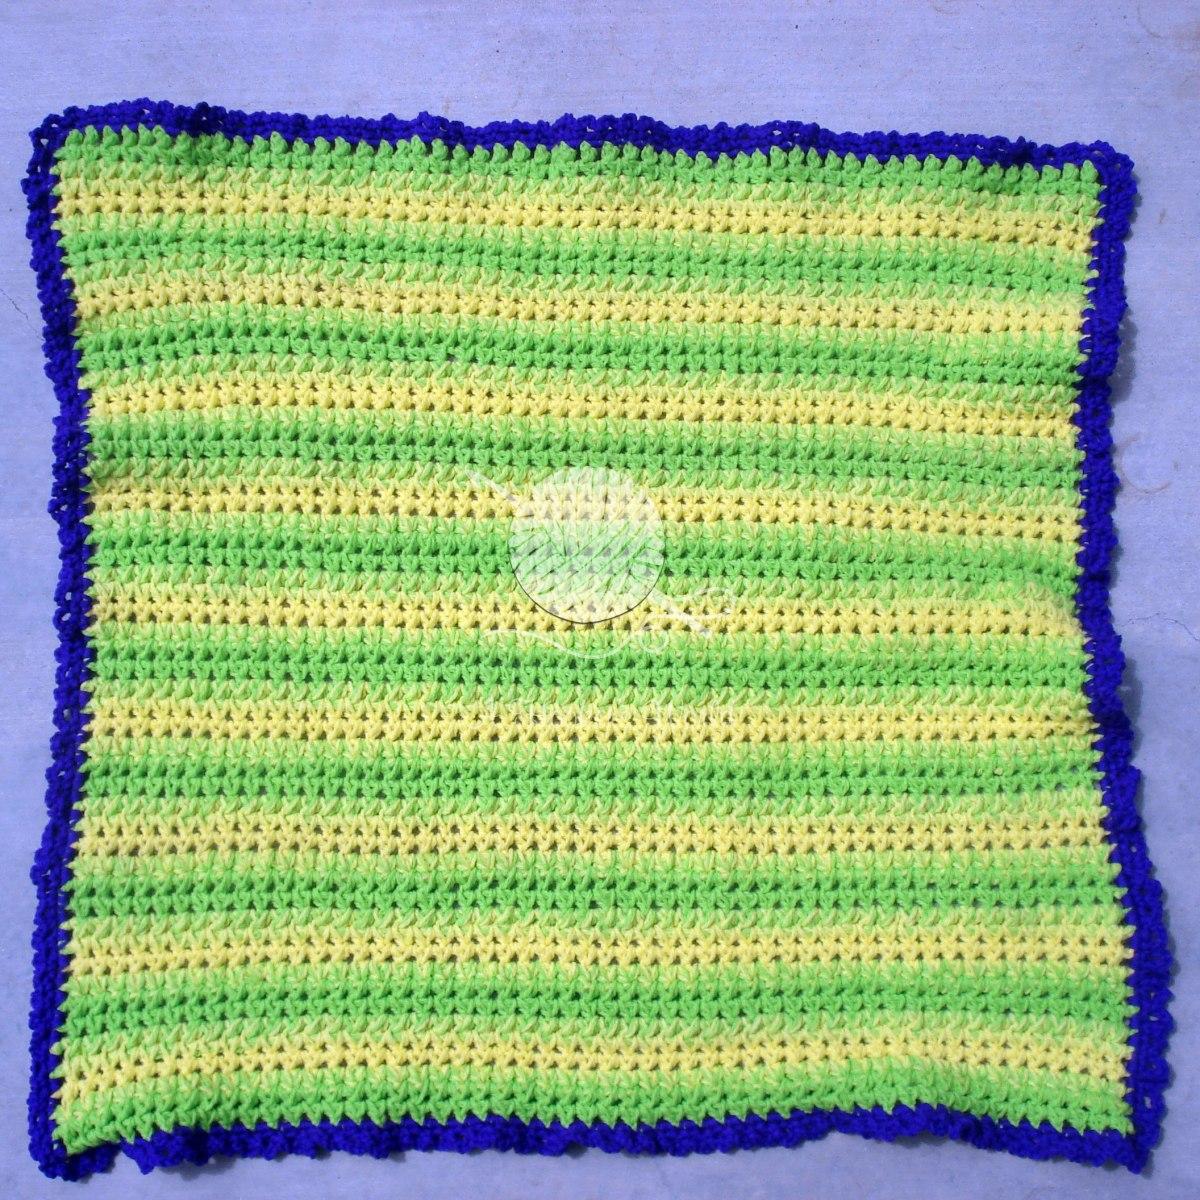 Groovy Baby BabyBlanket